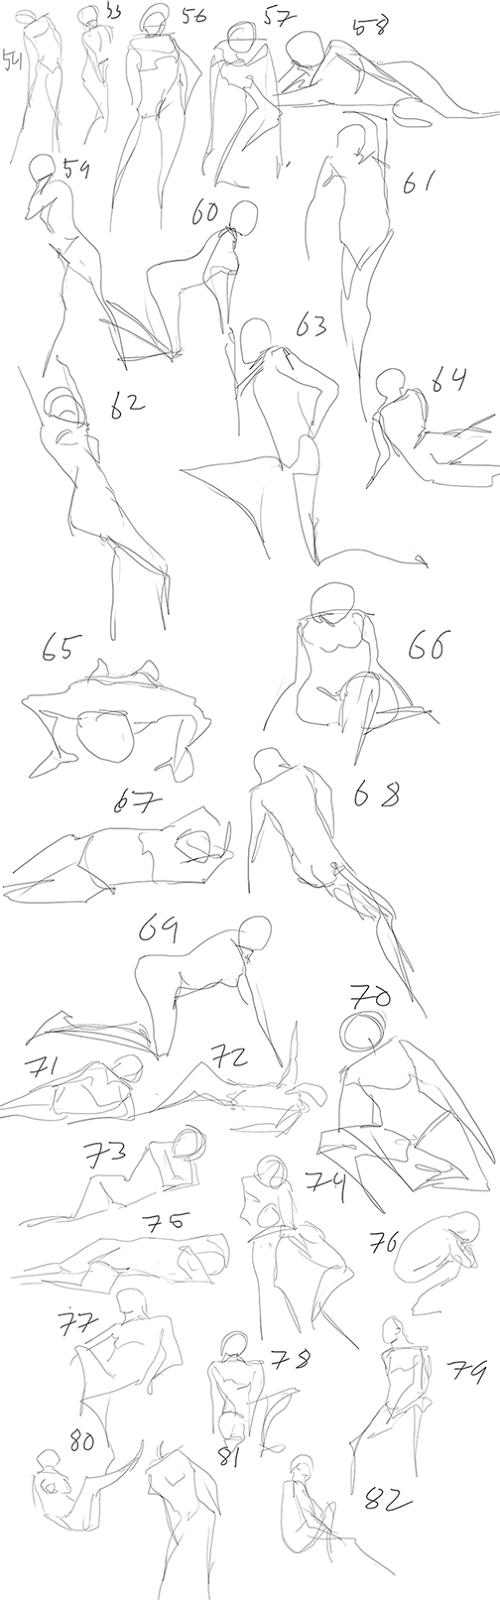 [Image: Gestures_20.png]